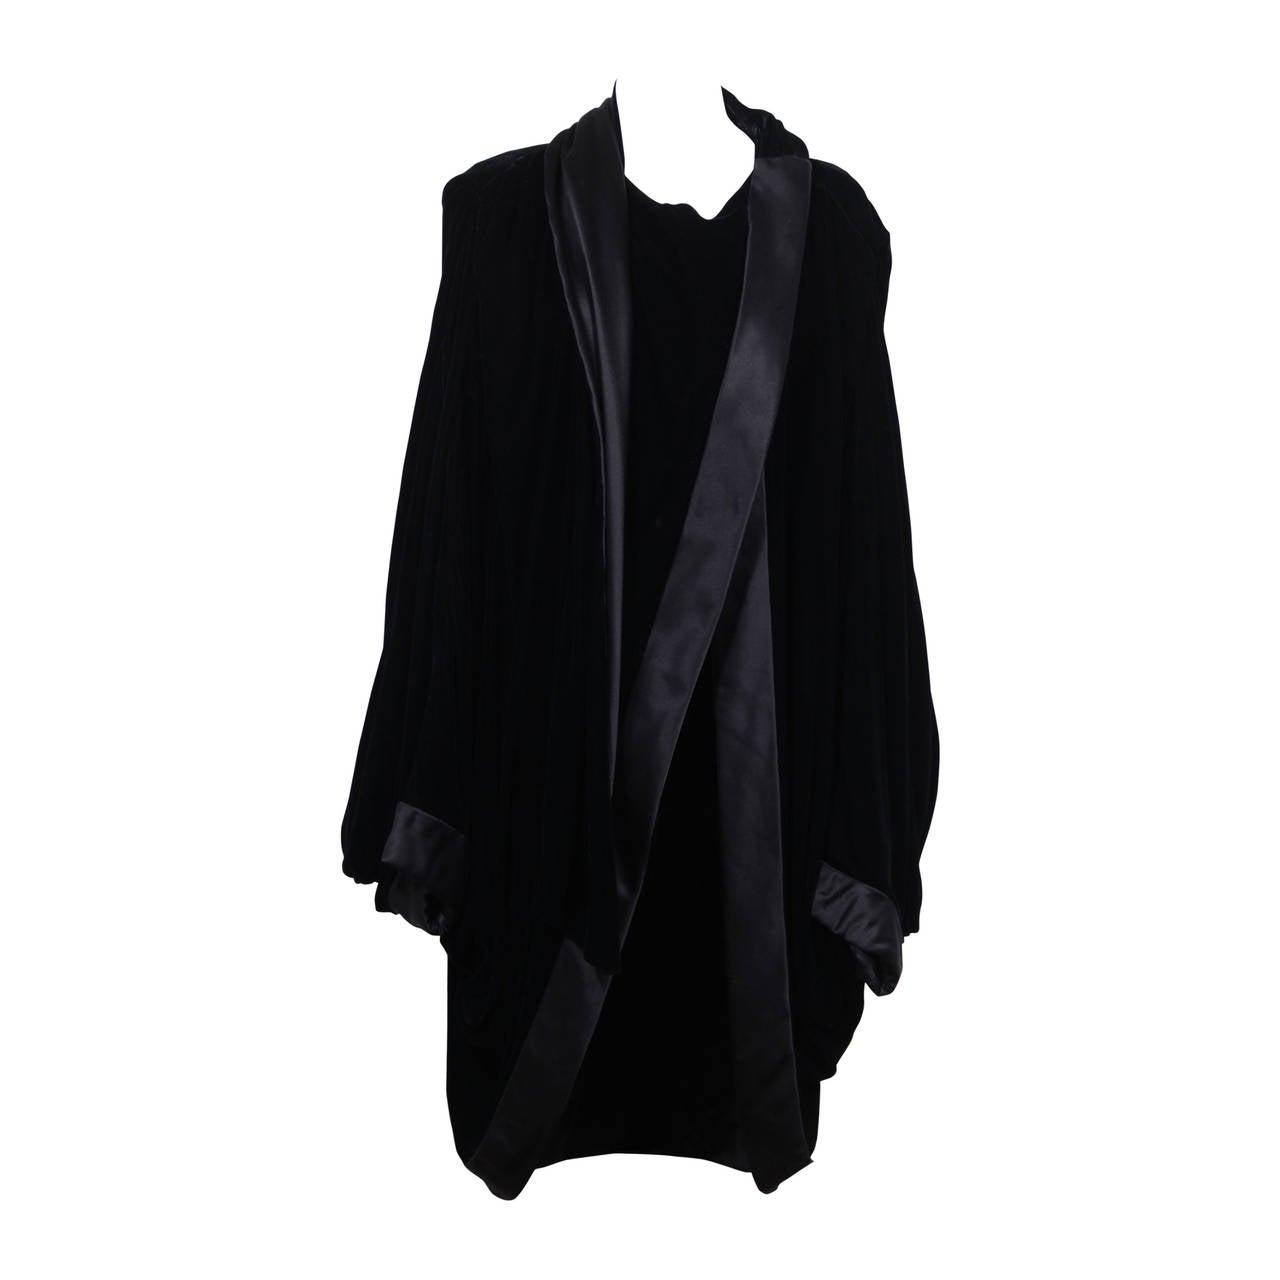 ANDREA ODICINI COUTURE Italian VINTAGE Black Velvet CAPE w/ DOLMAN Sleeves